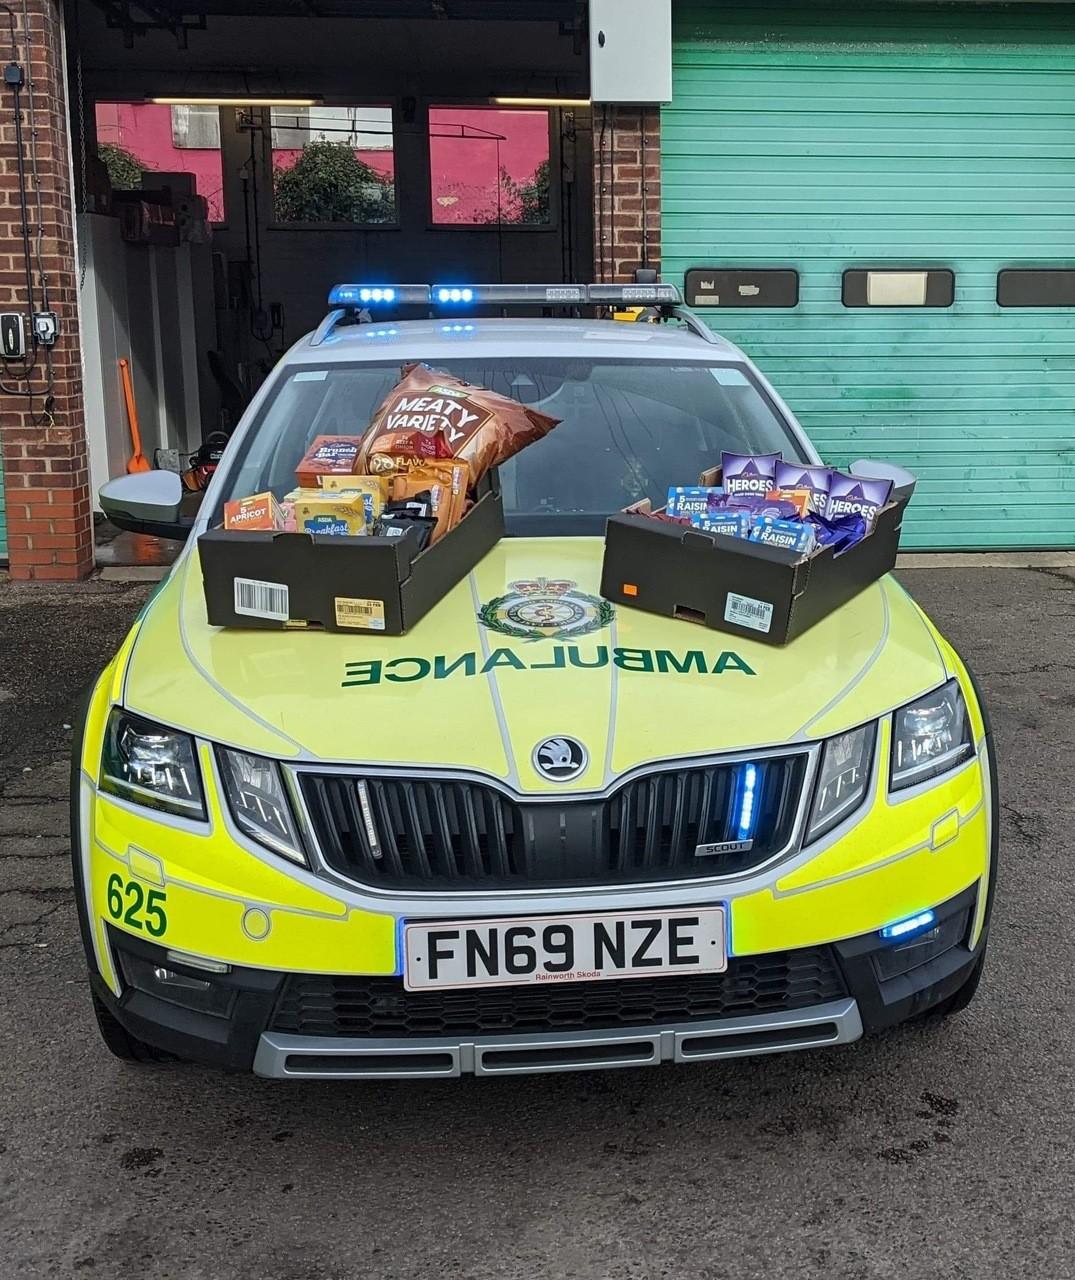 East of England ambulance | Asda Clacton-on-Sea